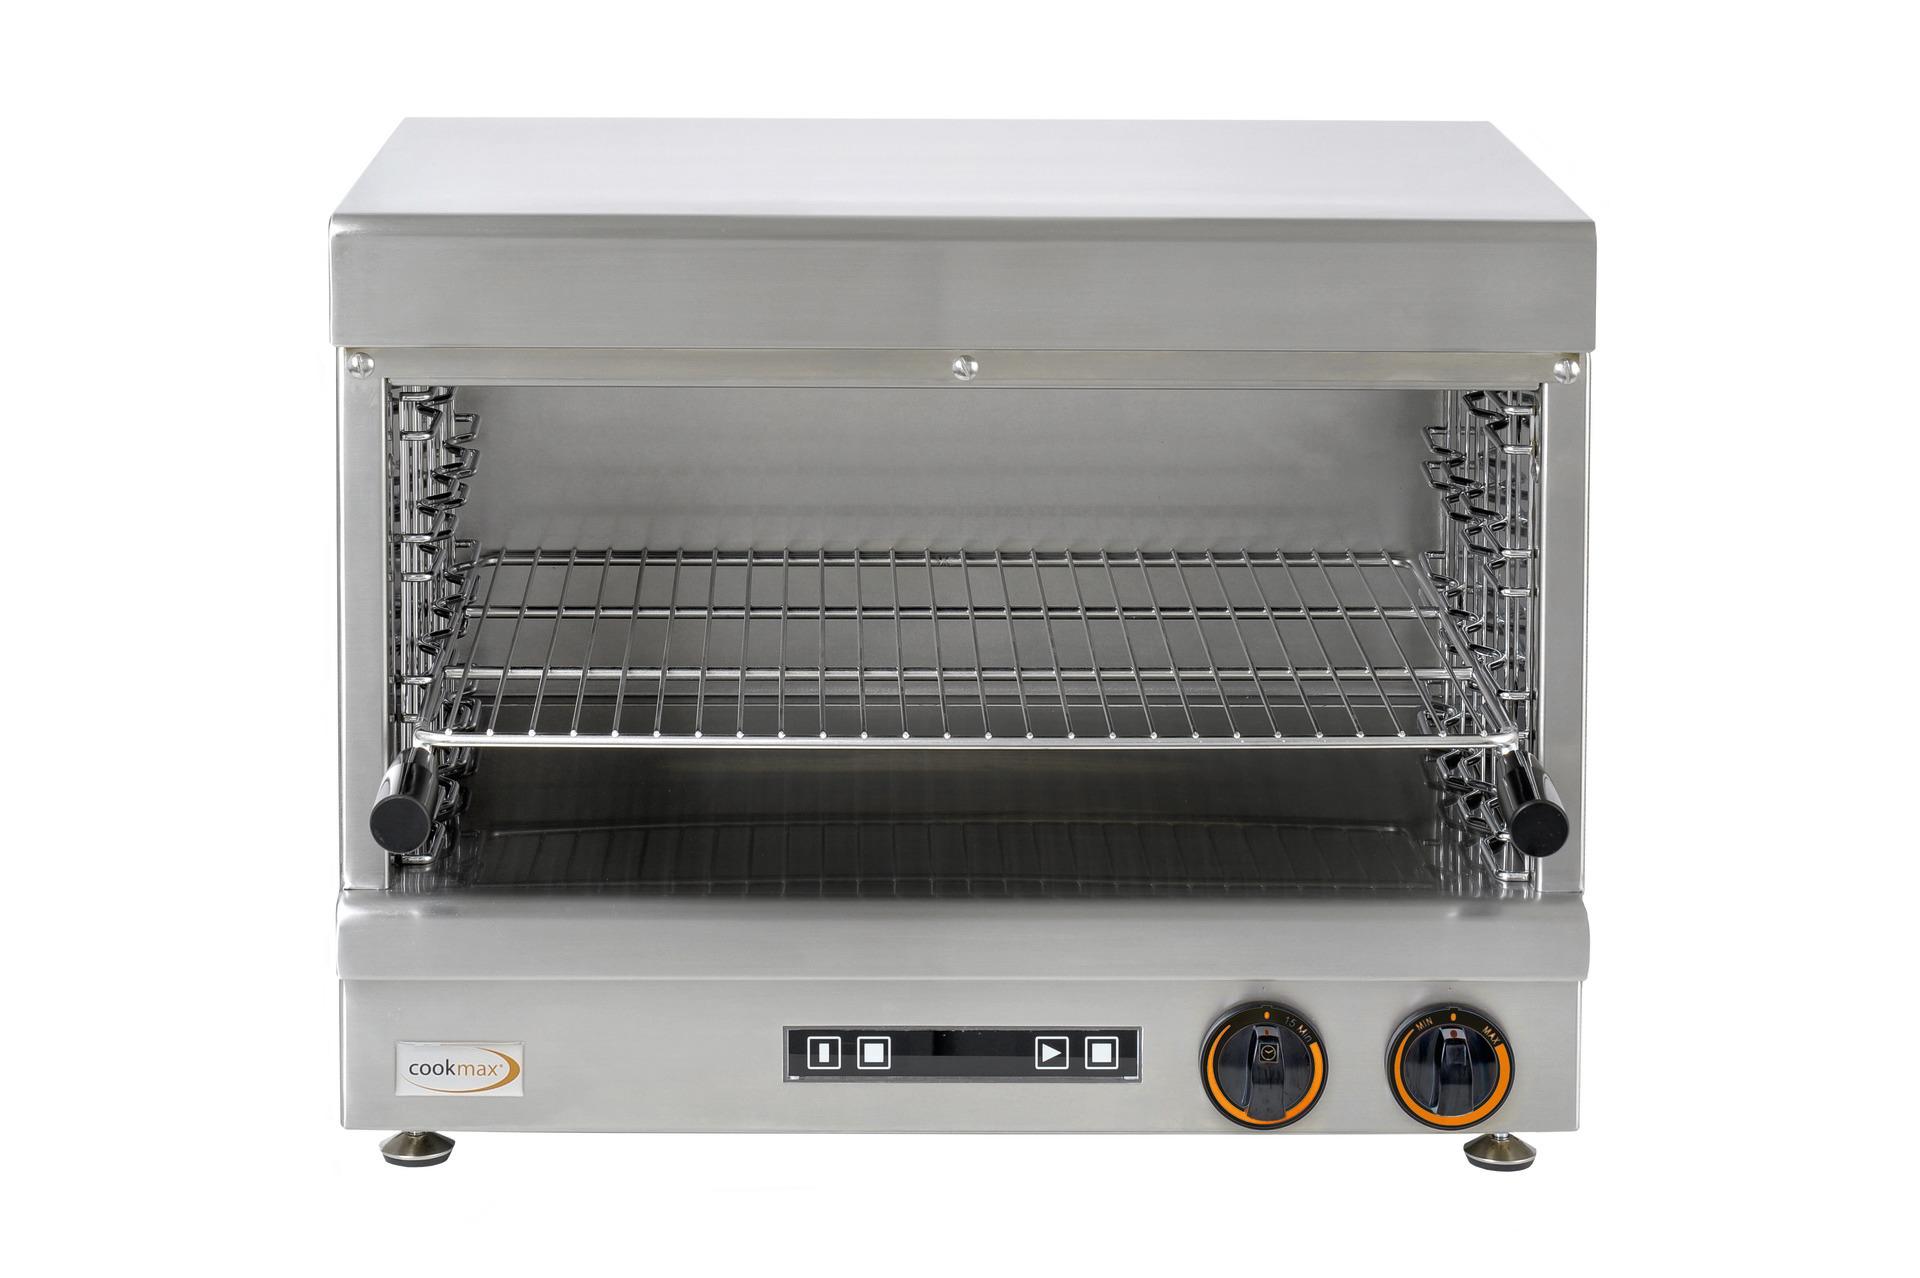 Energiespar-Salamander Hi-Light für GN 1/1 600 x 400 x 470 mm